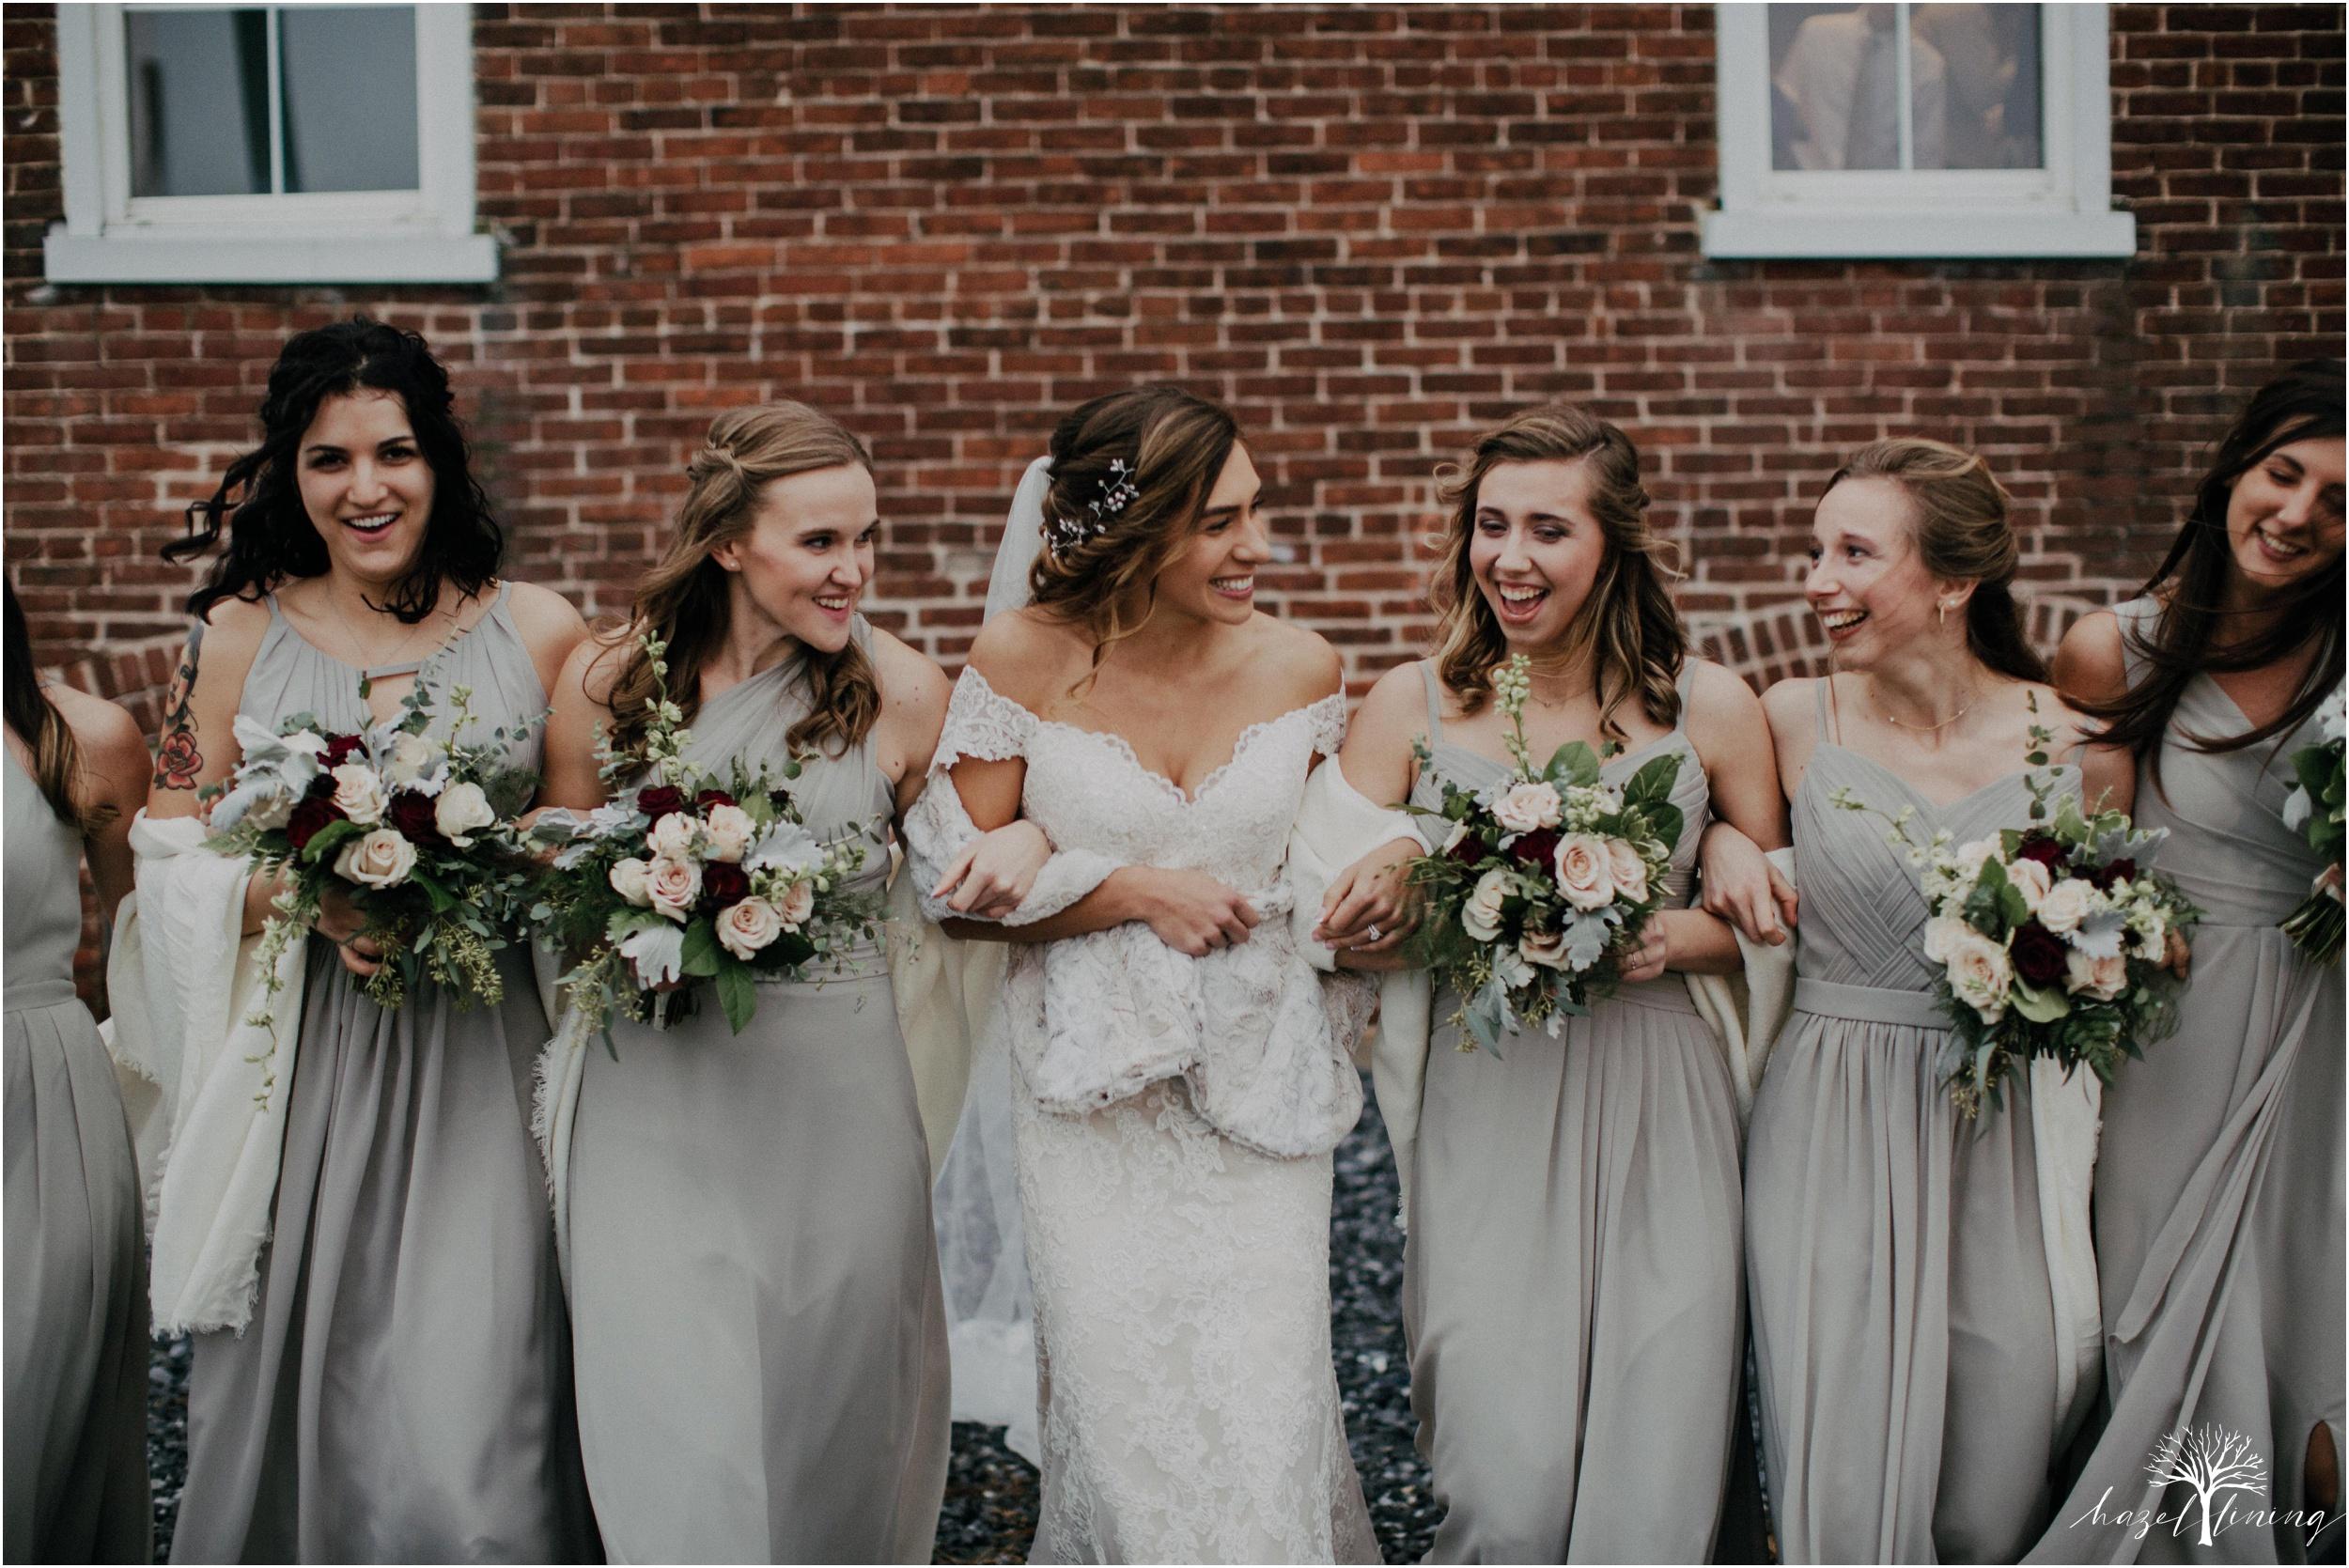 emma-matt-gehringer-the-booking-house-lancaster-manhiem-pennsylvania-winter-wedding_0085.jpg